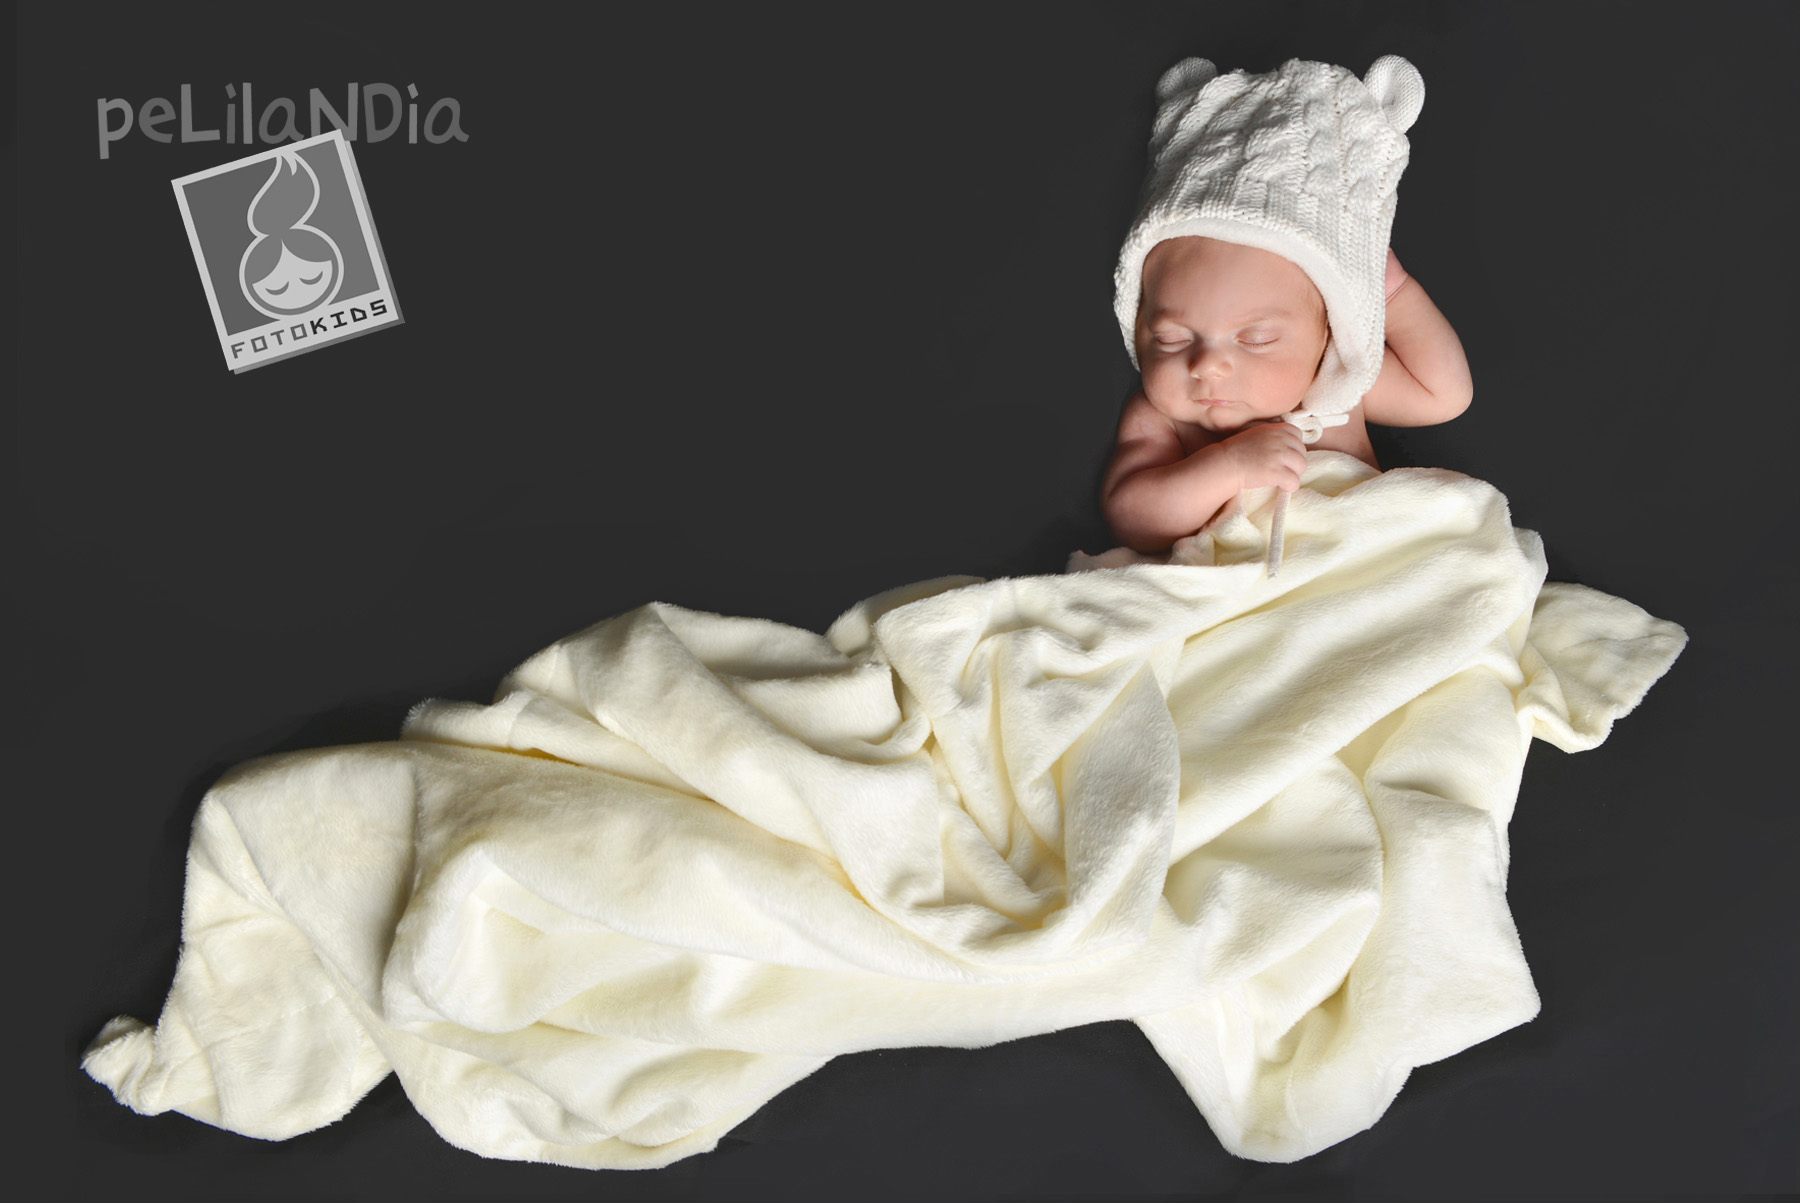 malaga new born